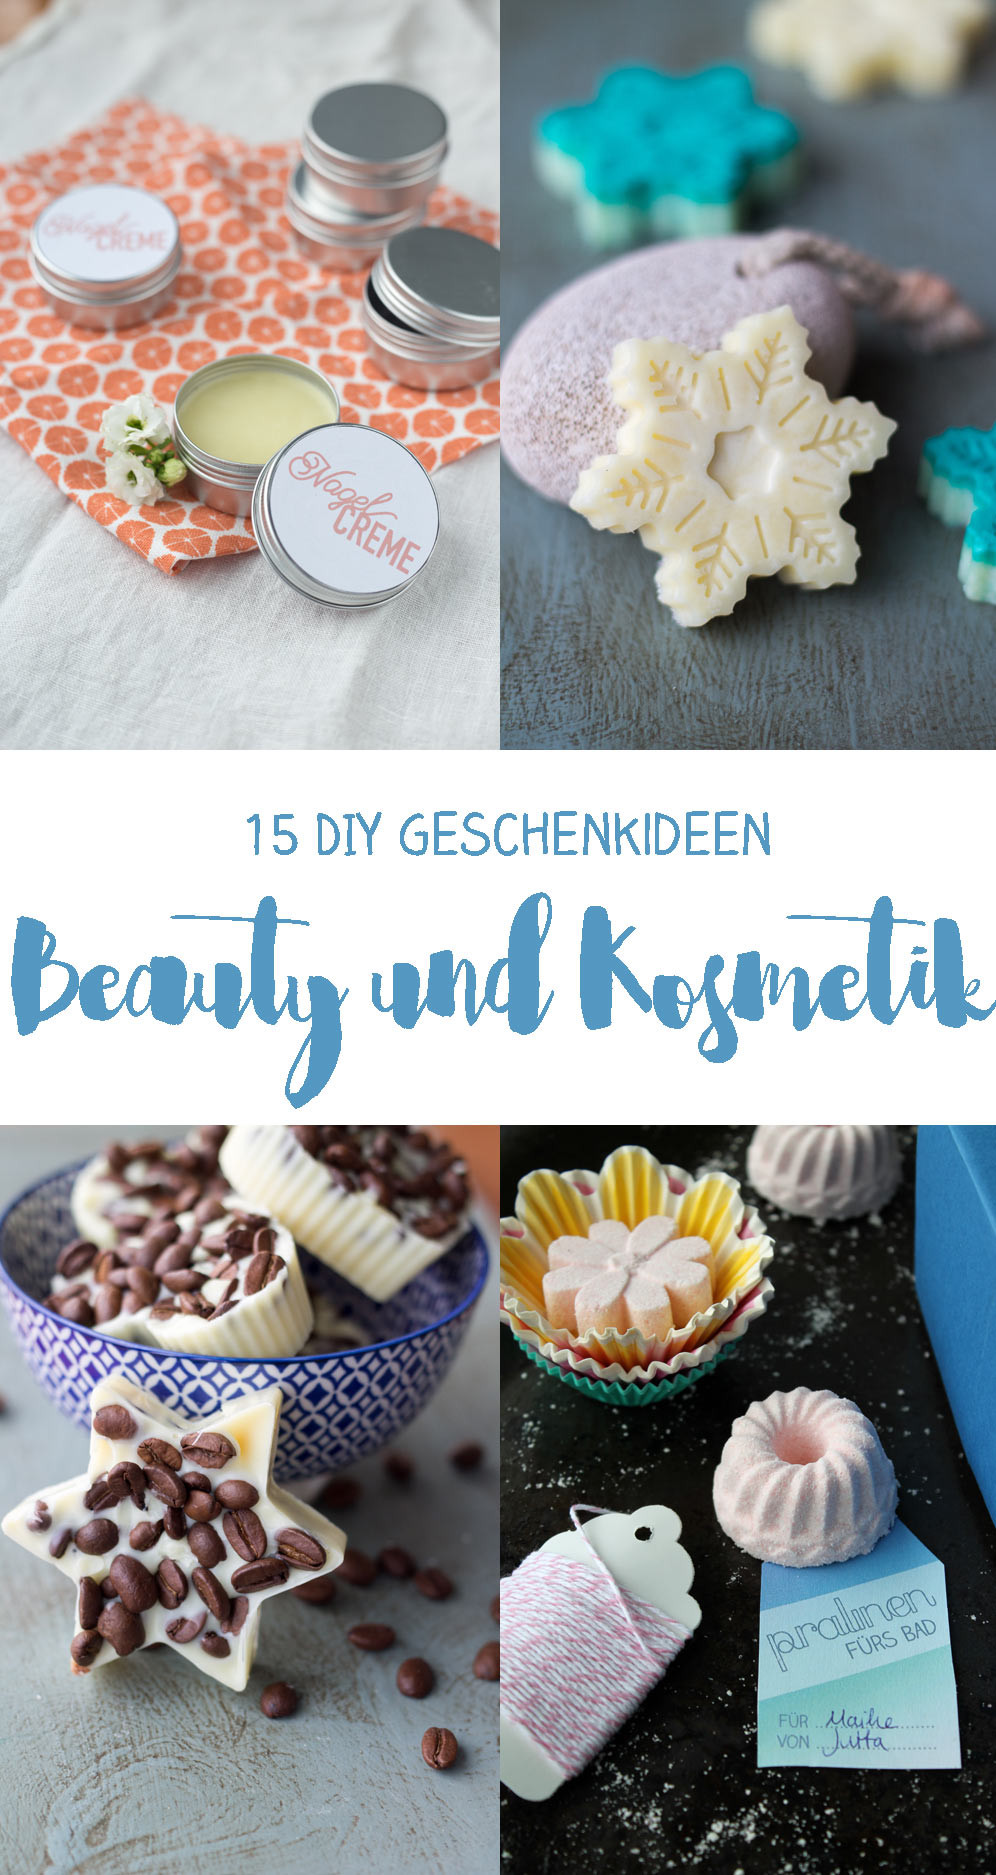 Diy Geschenk  15 DIY Kosmetik Geschenkideen zum Selbermachen